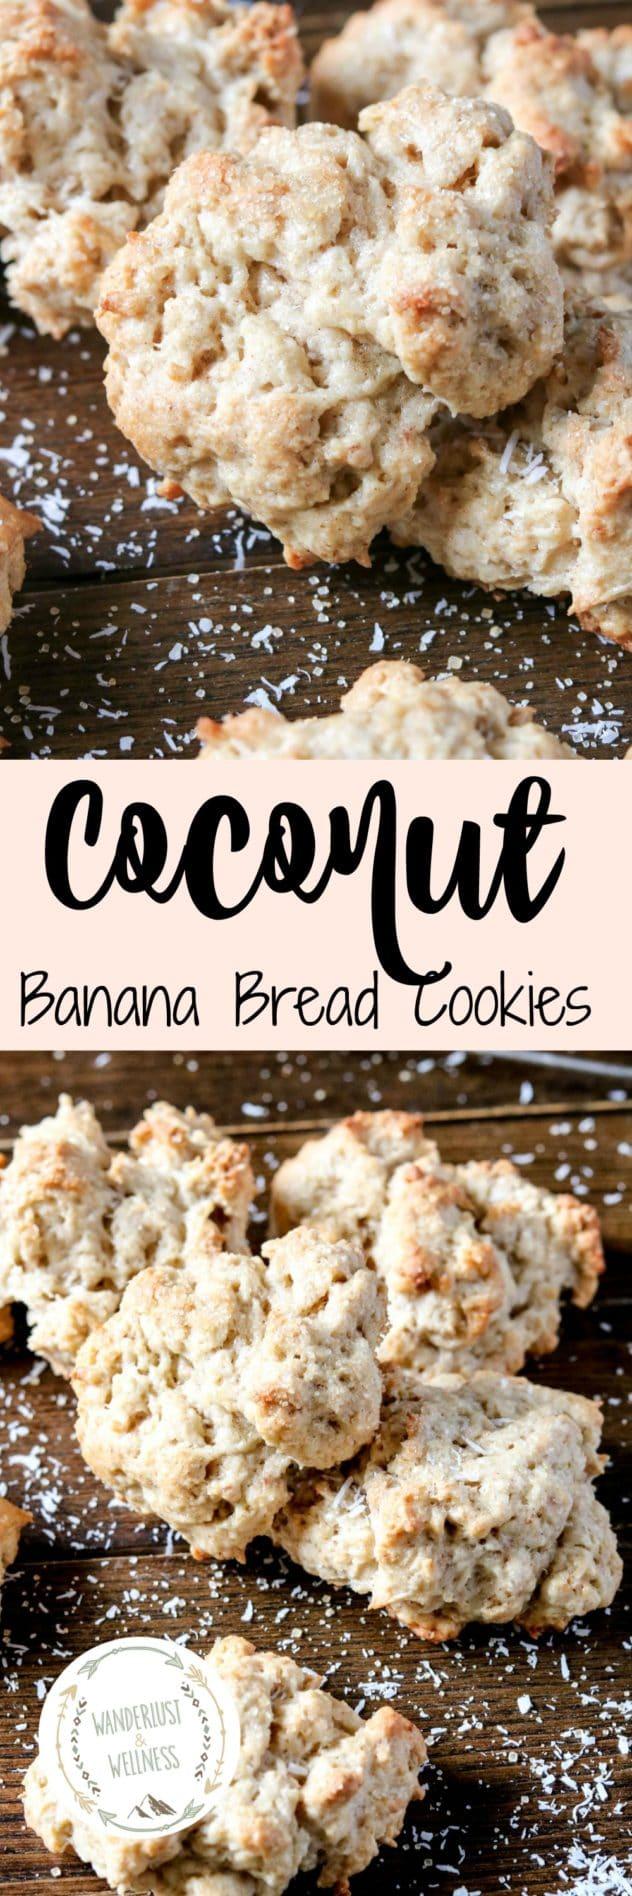 Coconut Banana Bread Cookies